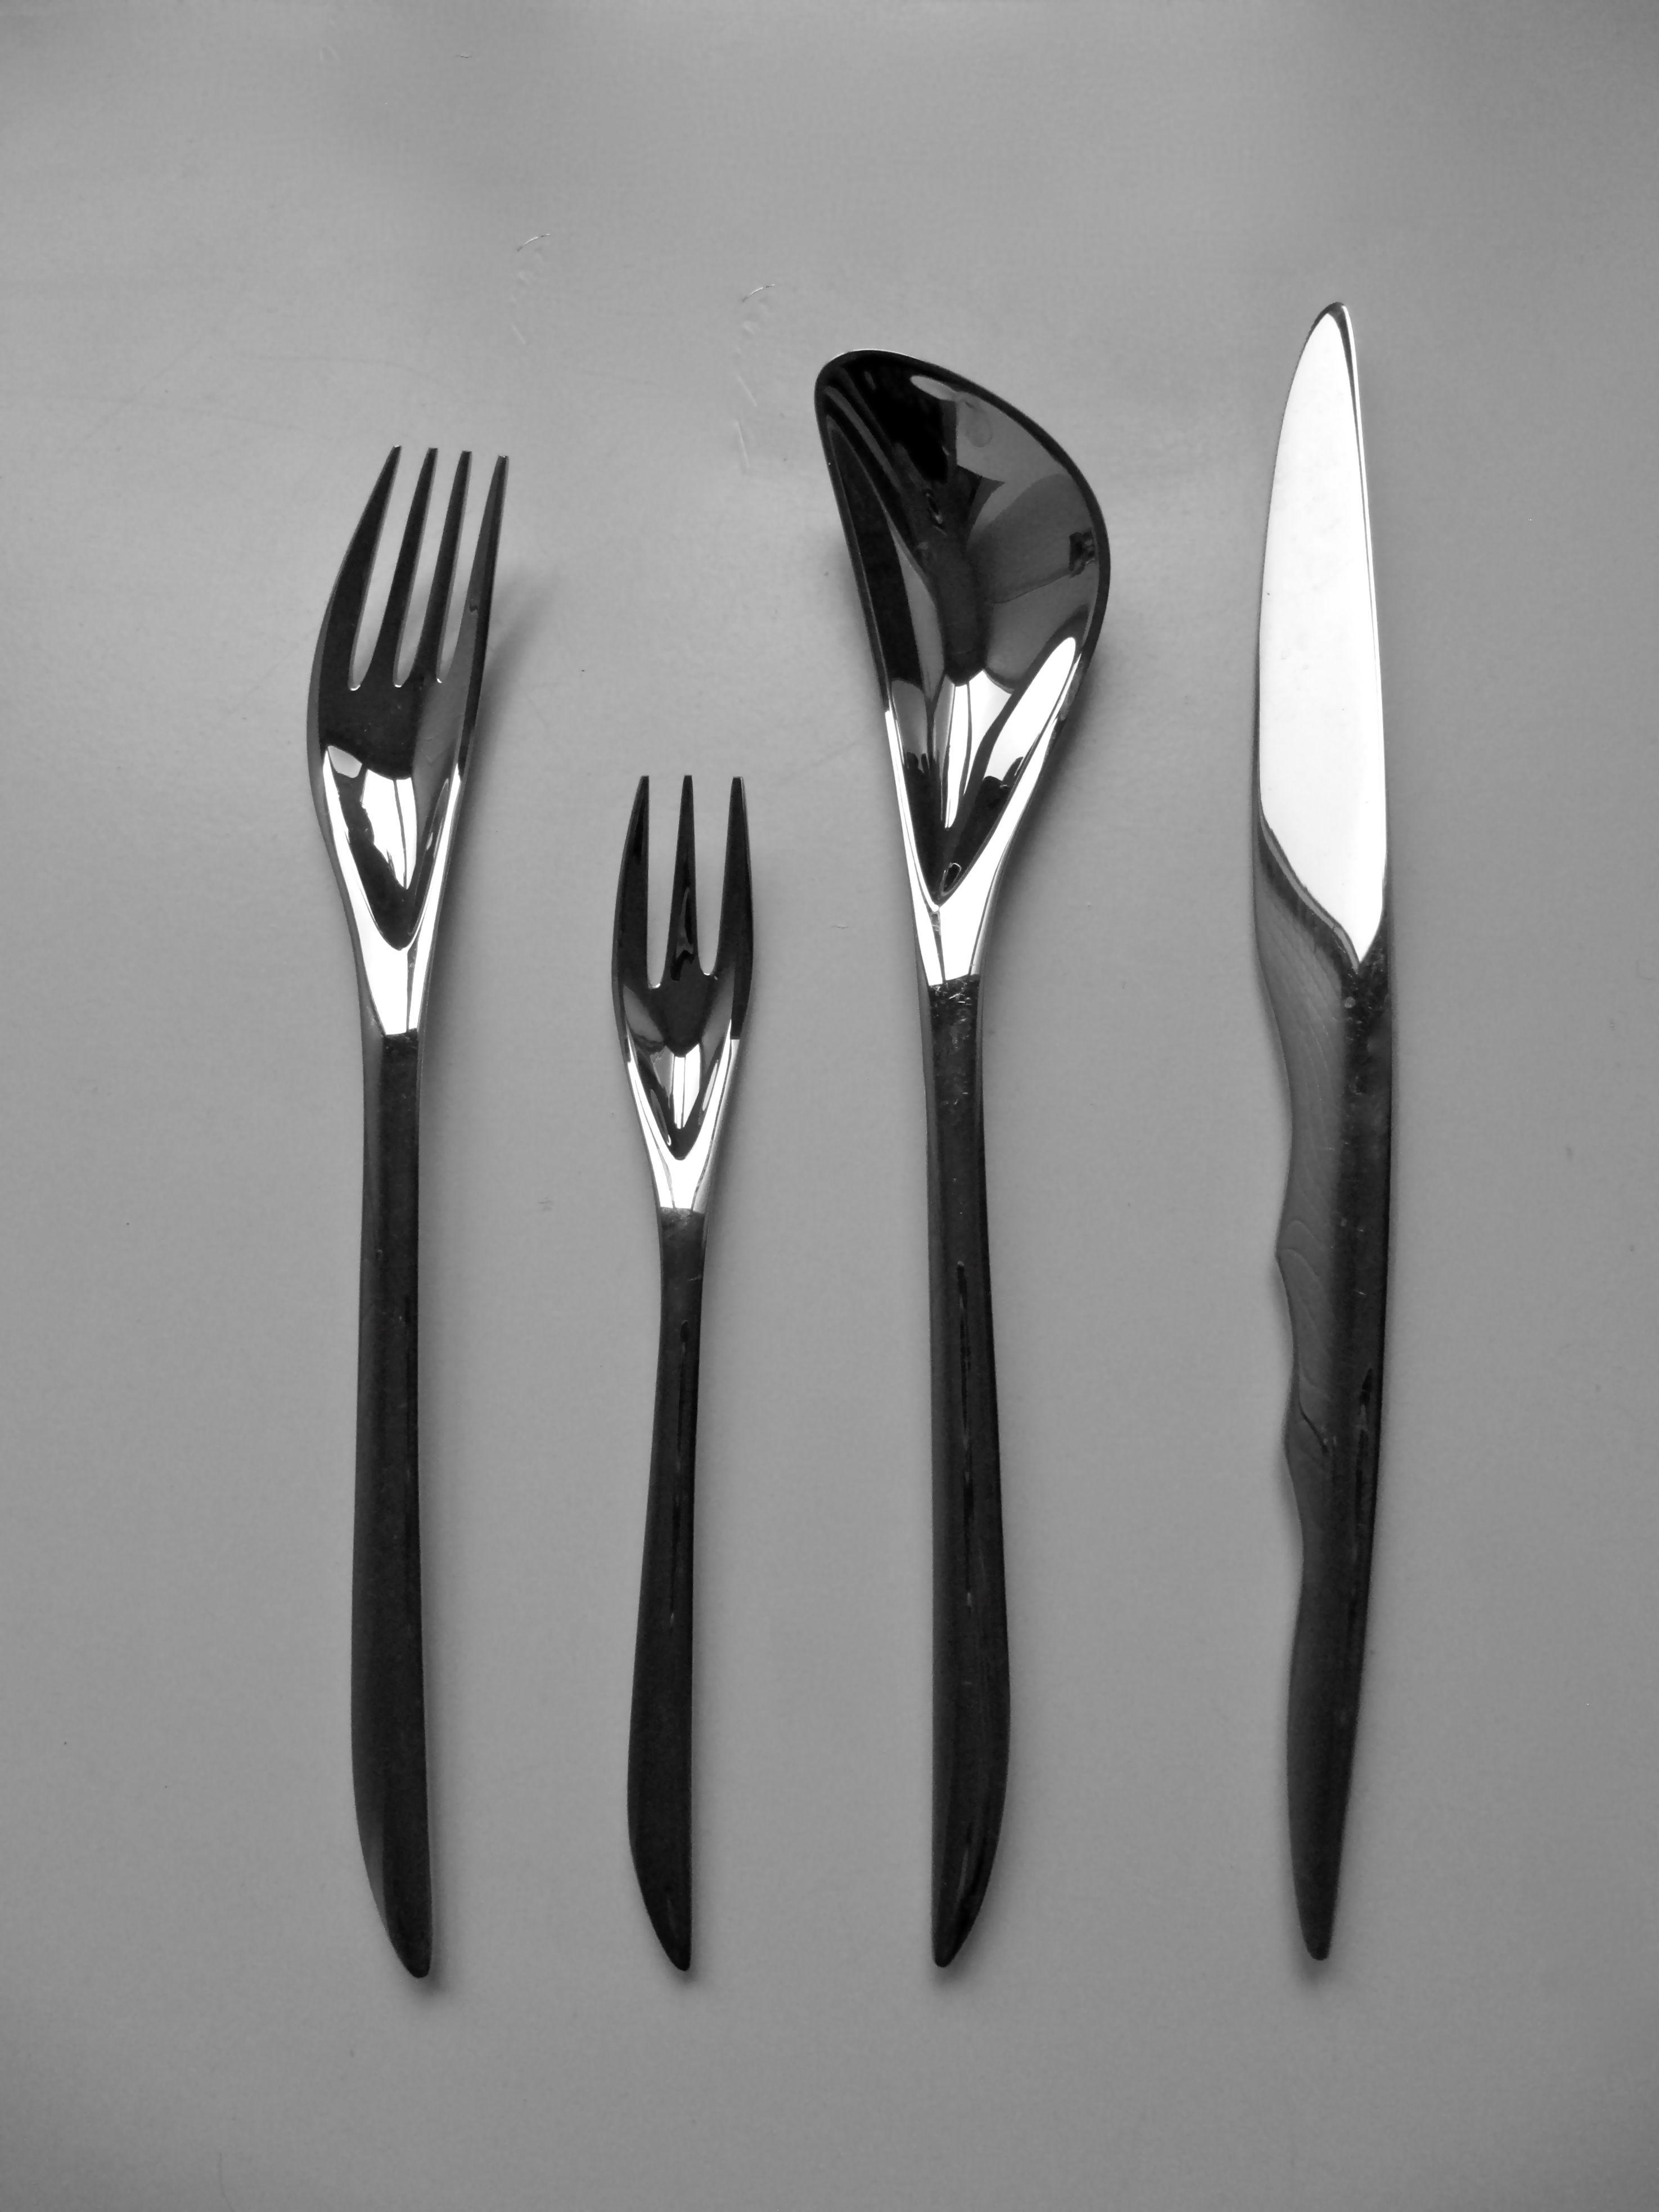 zaha hadid zaha 2007 producer wmf cuillère couteau